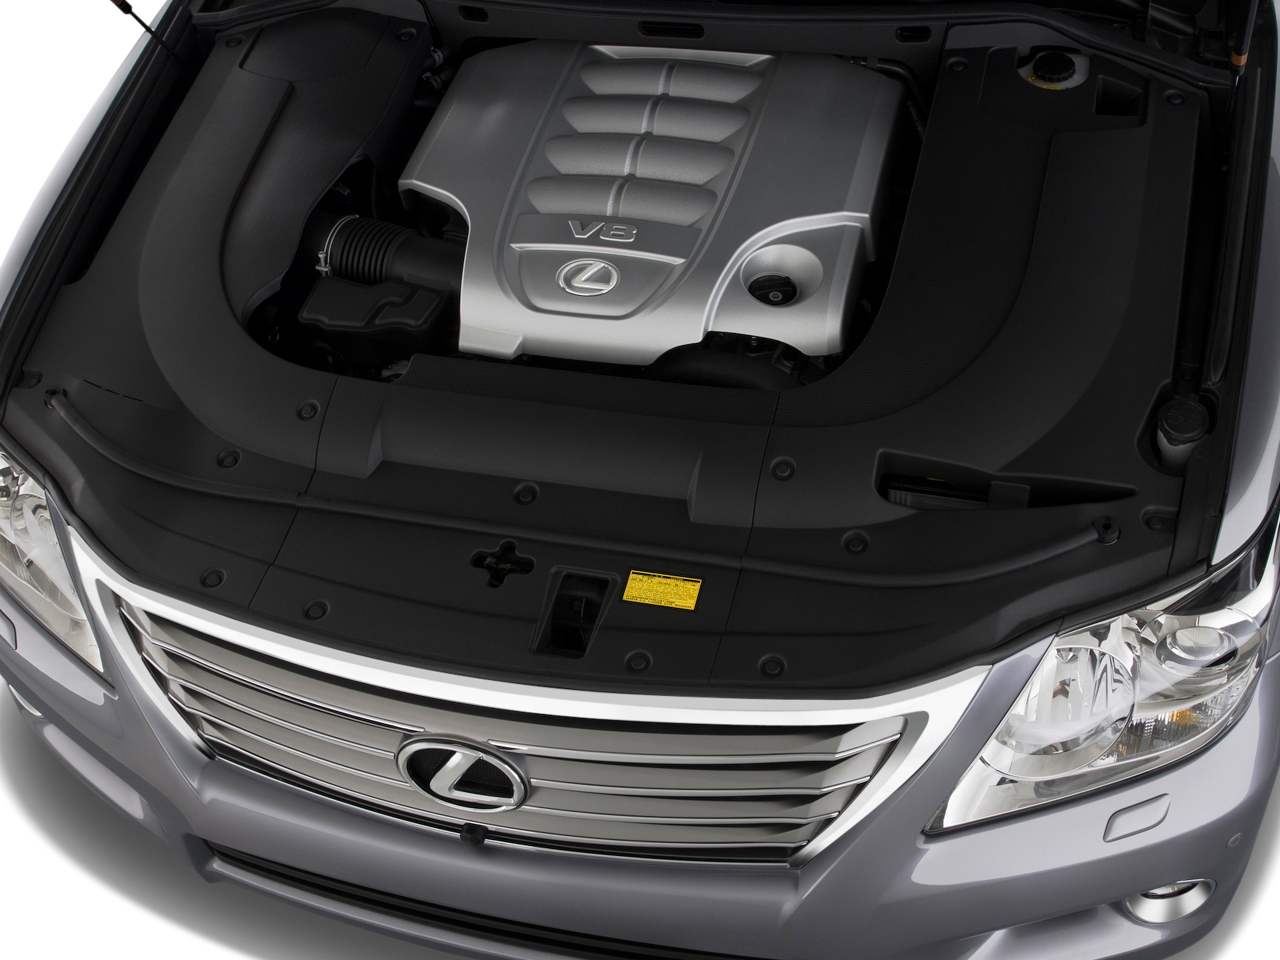 http://st.automobilemag.com/uploads/sites/10/2015/11/2008-lexus-lx-570-sport-utility-suv-engine.png